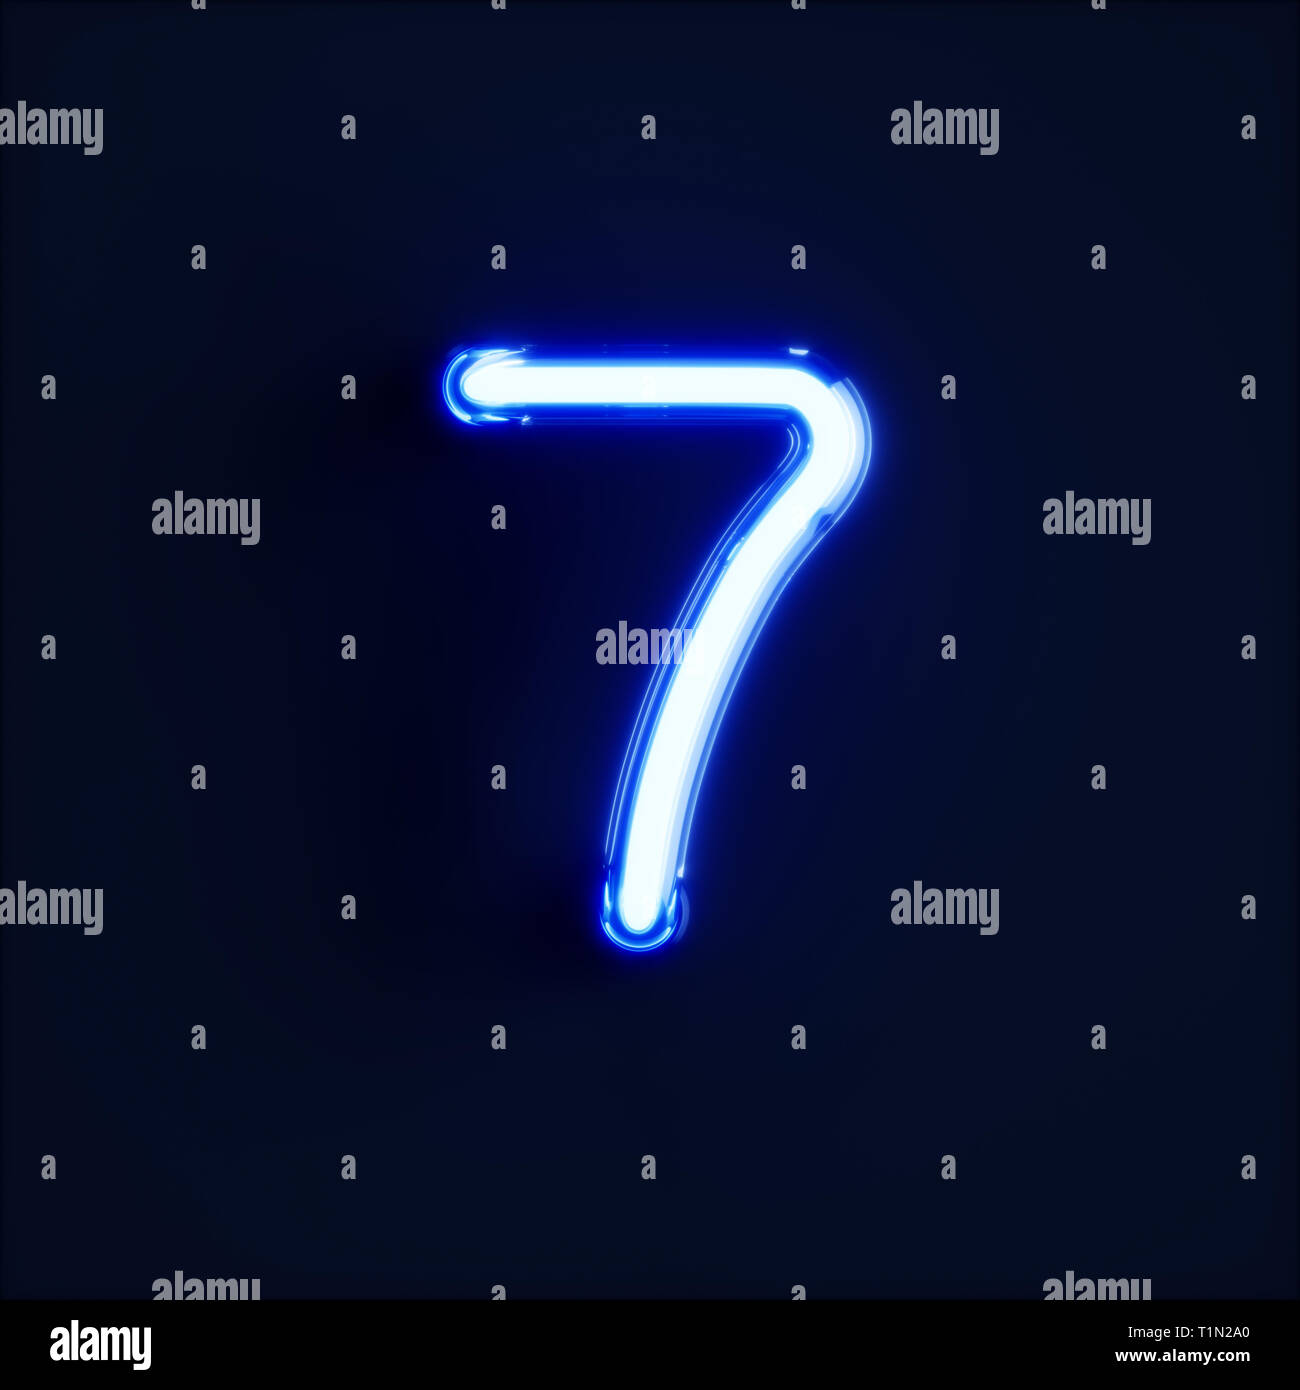 Neon Glowing Effect Png Hd